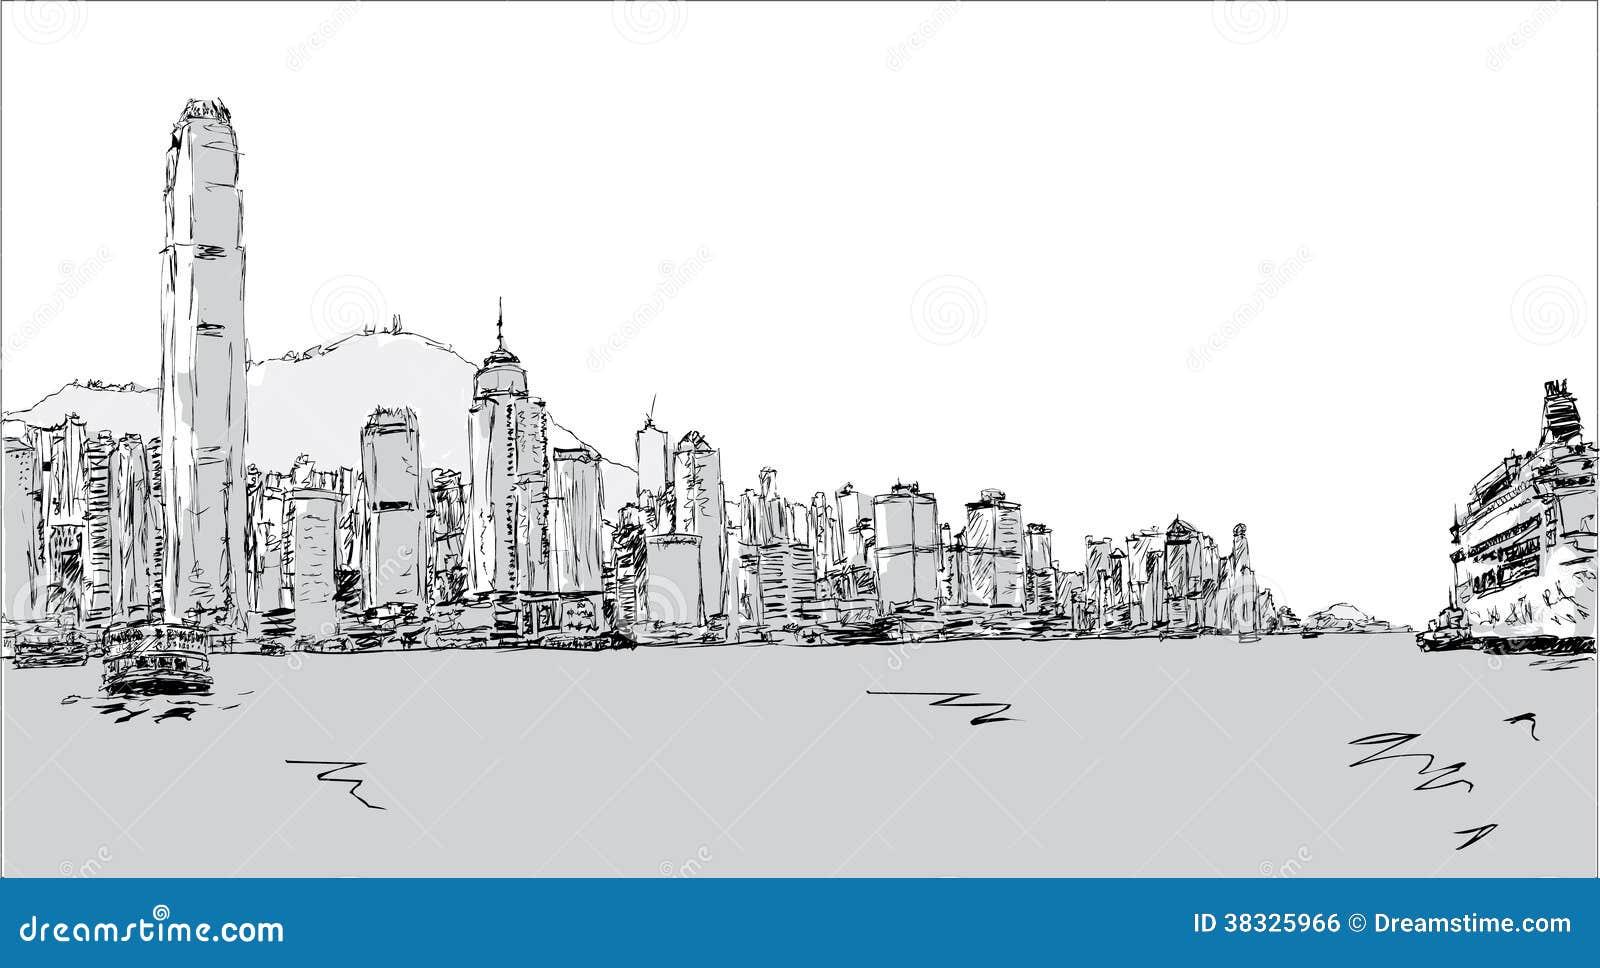 Hong Kong Island stock vector. Image of drawn, skyscrapers